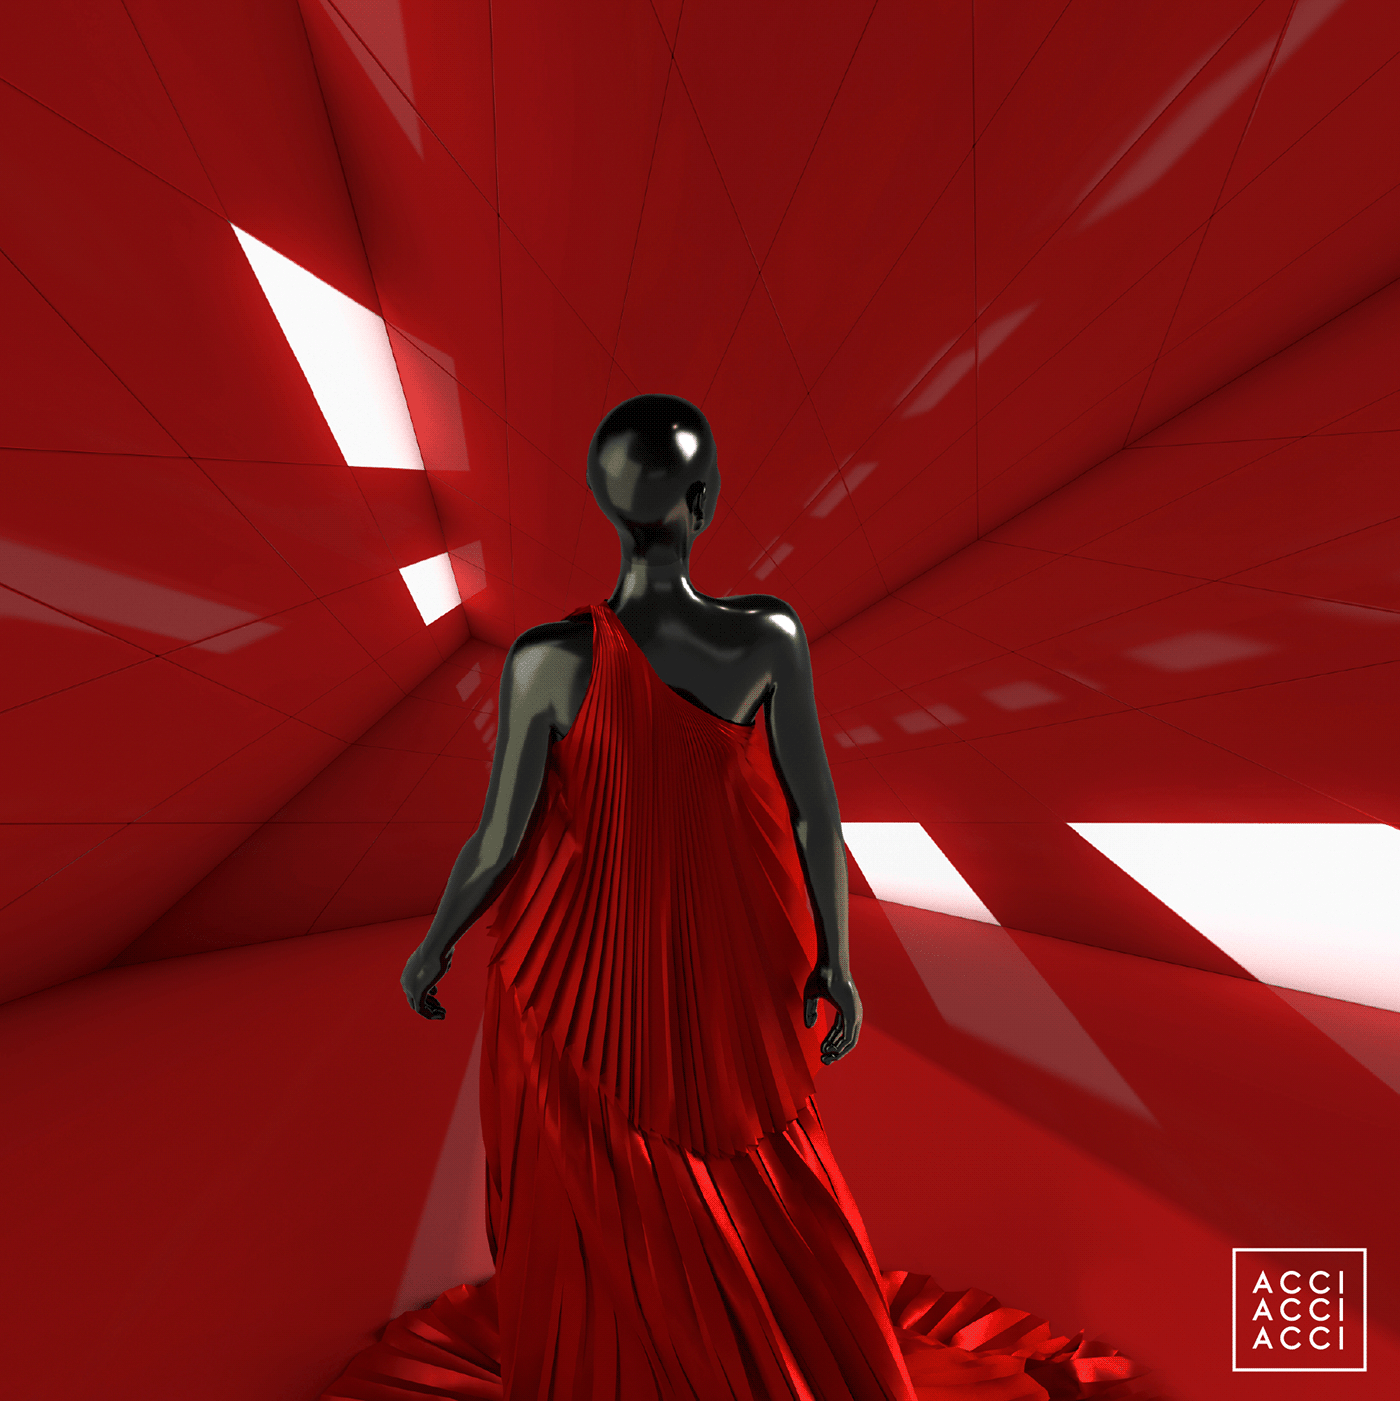 #3D #3dfashion #3dmodeling #brasil #Fashion #Fashion3D #fashionvirtual #virtualfashion